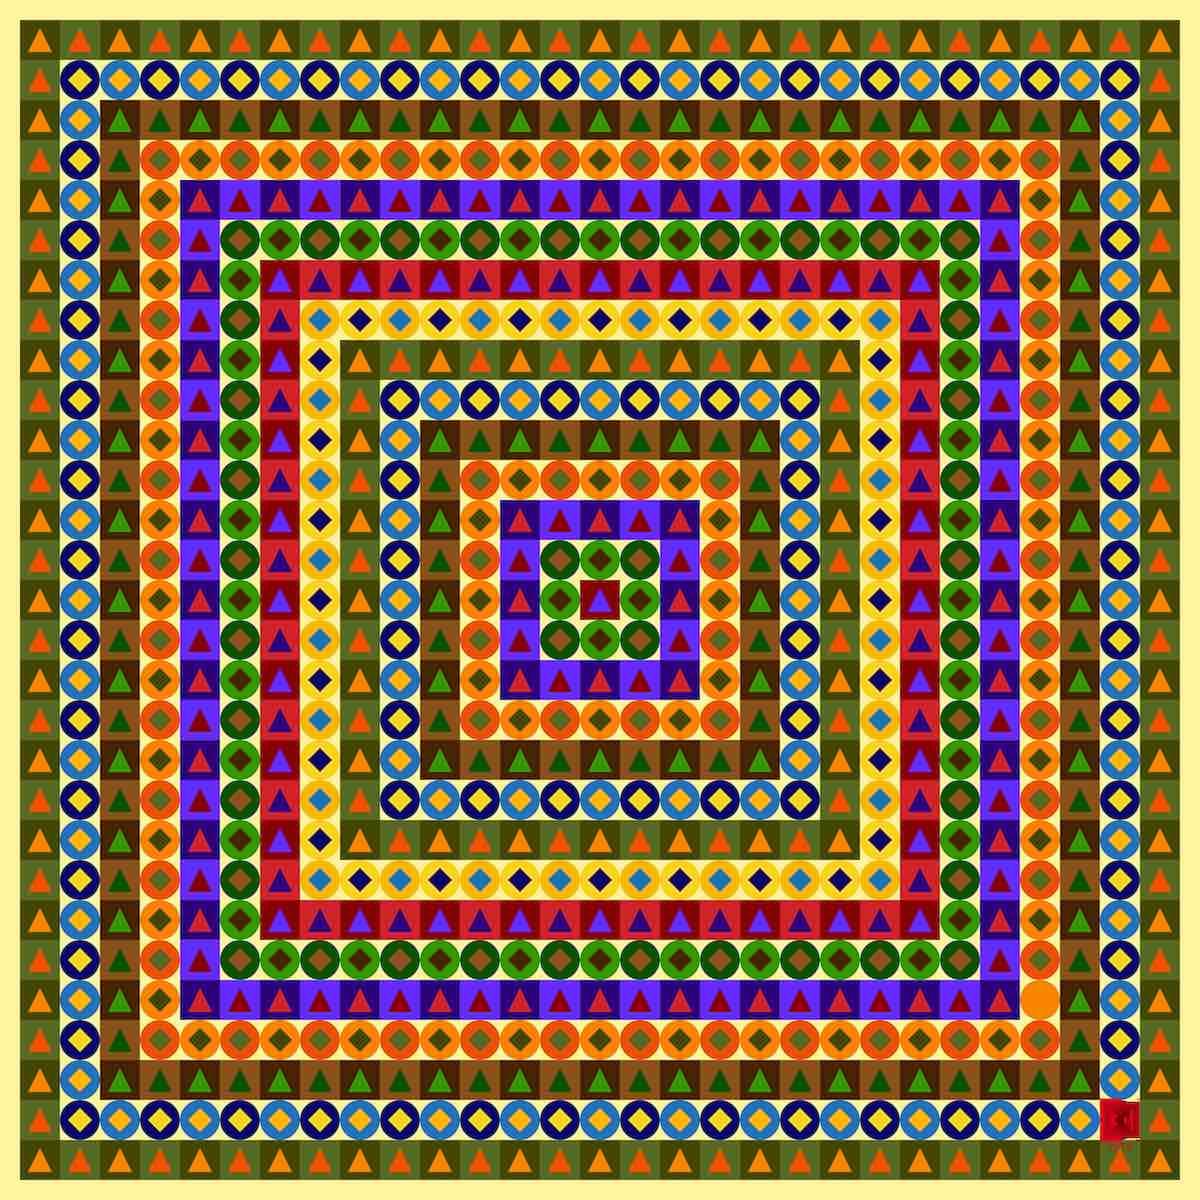 108 (600 x 600).jpg